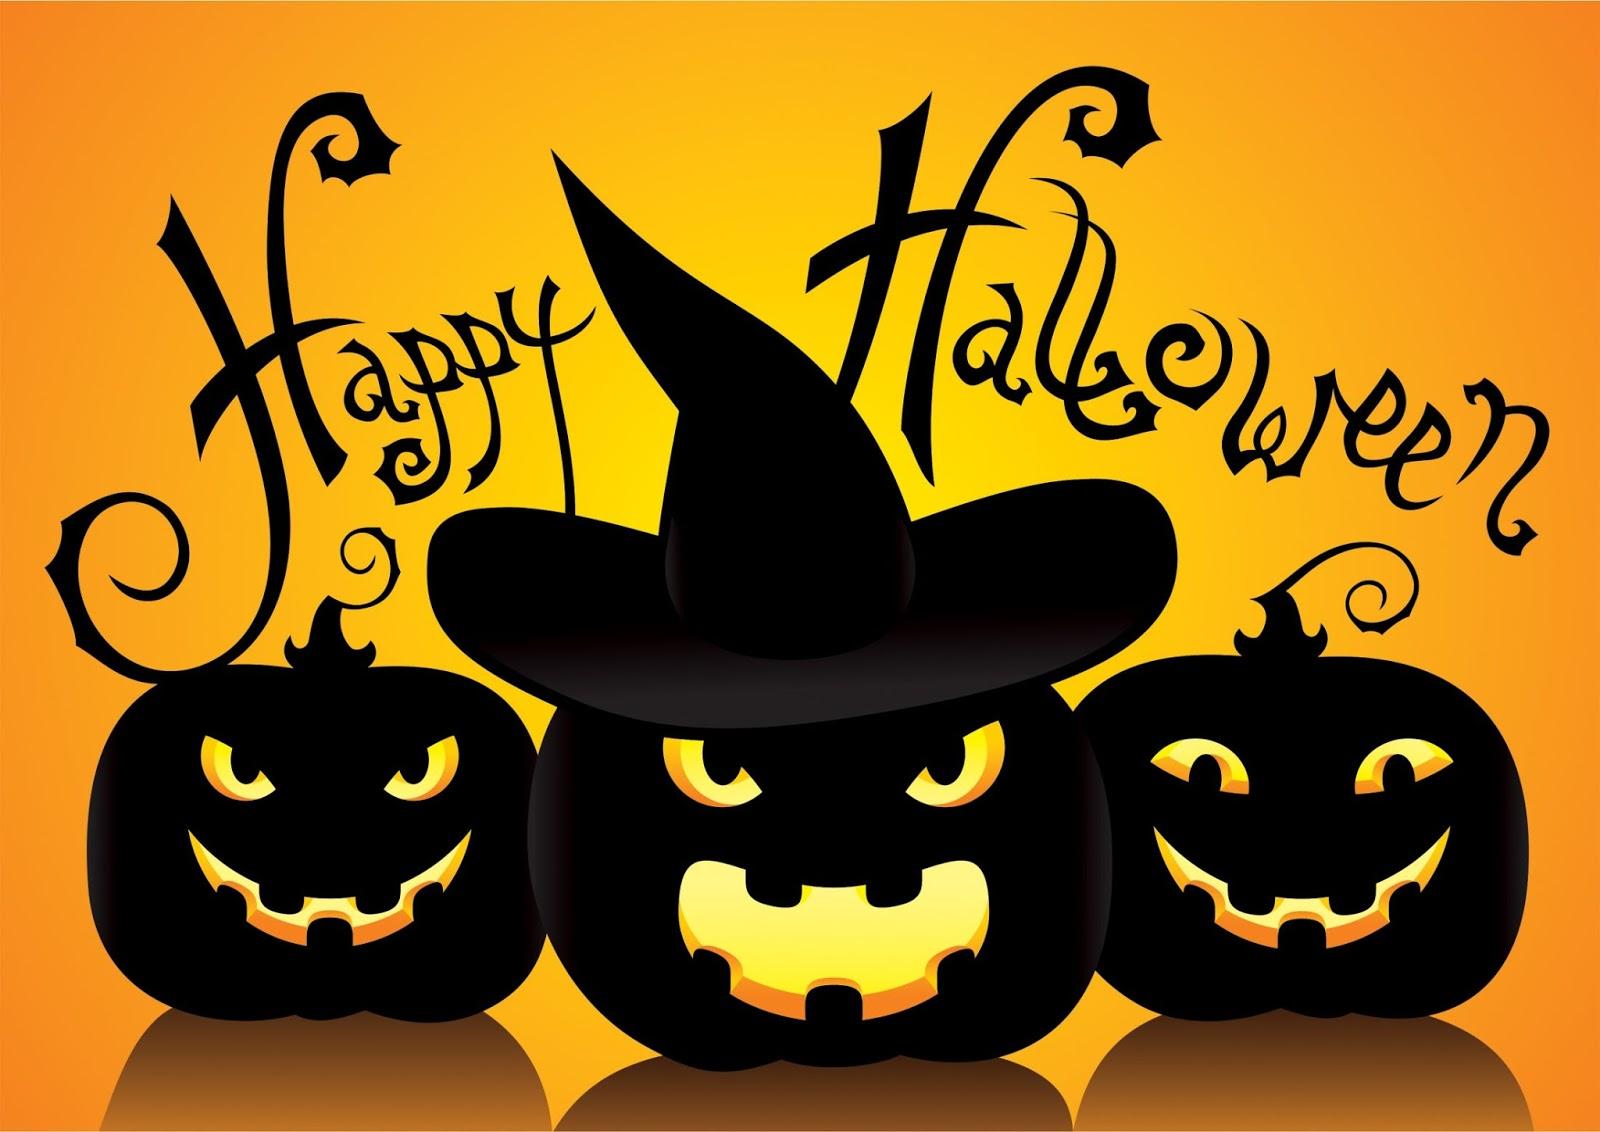 Wonderful Wallpaper Halloween Facebook - Download%2BHalloween%2BFairy%2BPictures%2BHD%2BWallpapers%2BFor%2BFacebook%2BTwitter%2B%2526%2BWhatsapp  Picture_47694.jpg